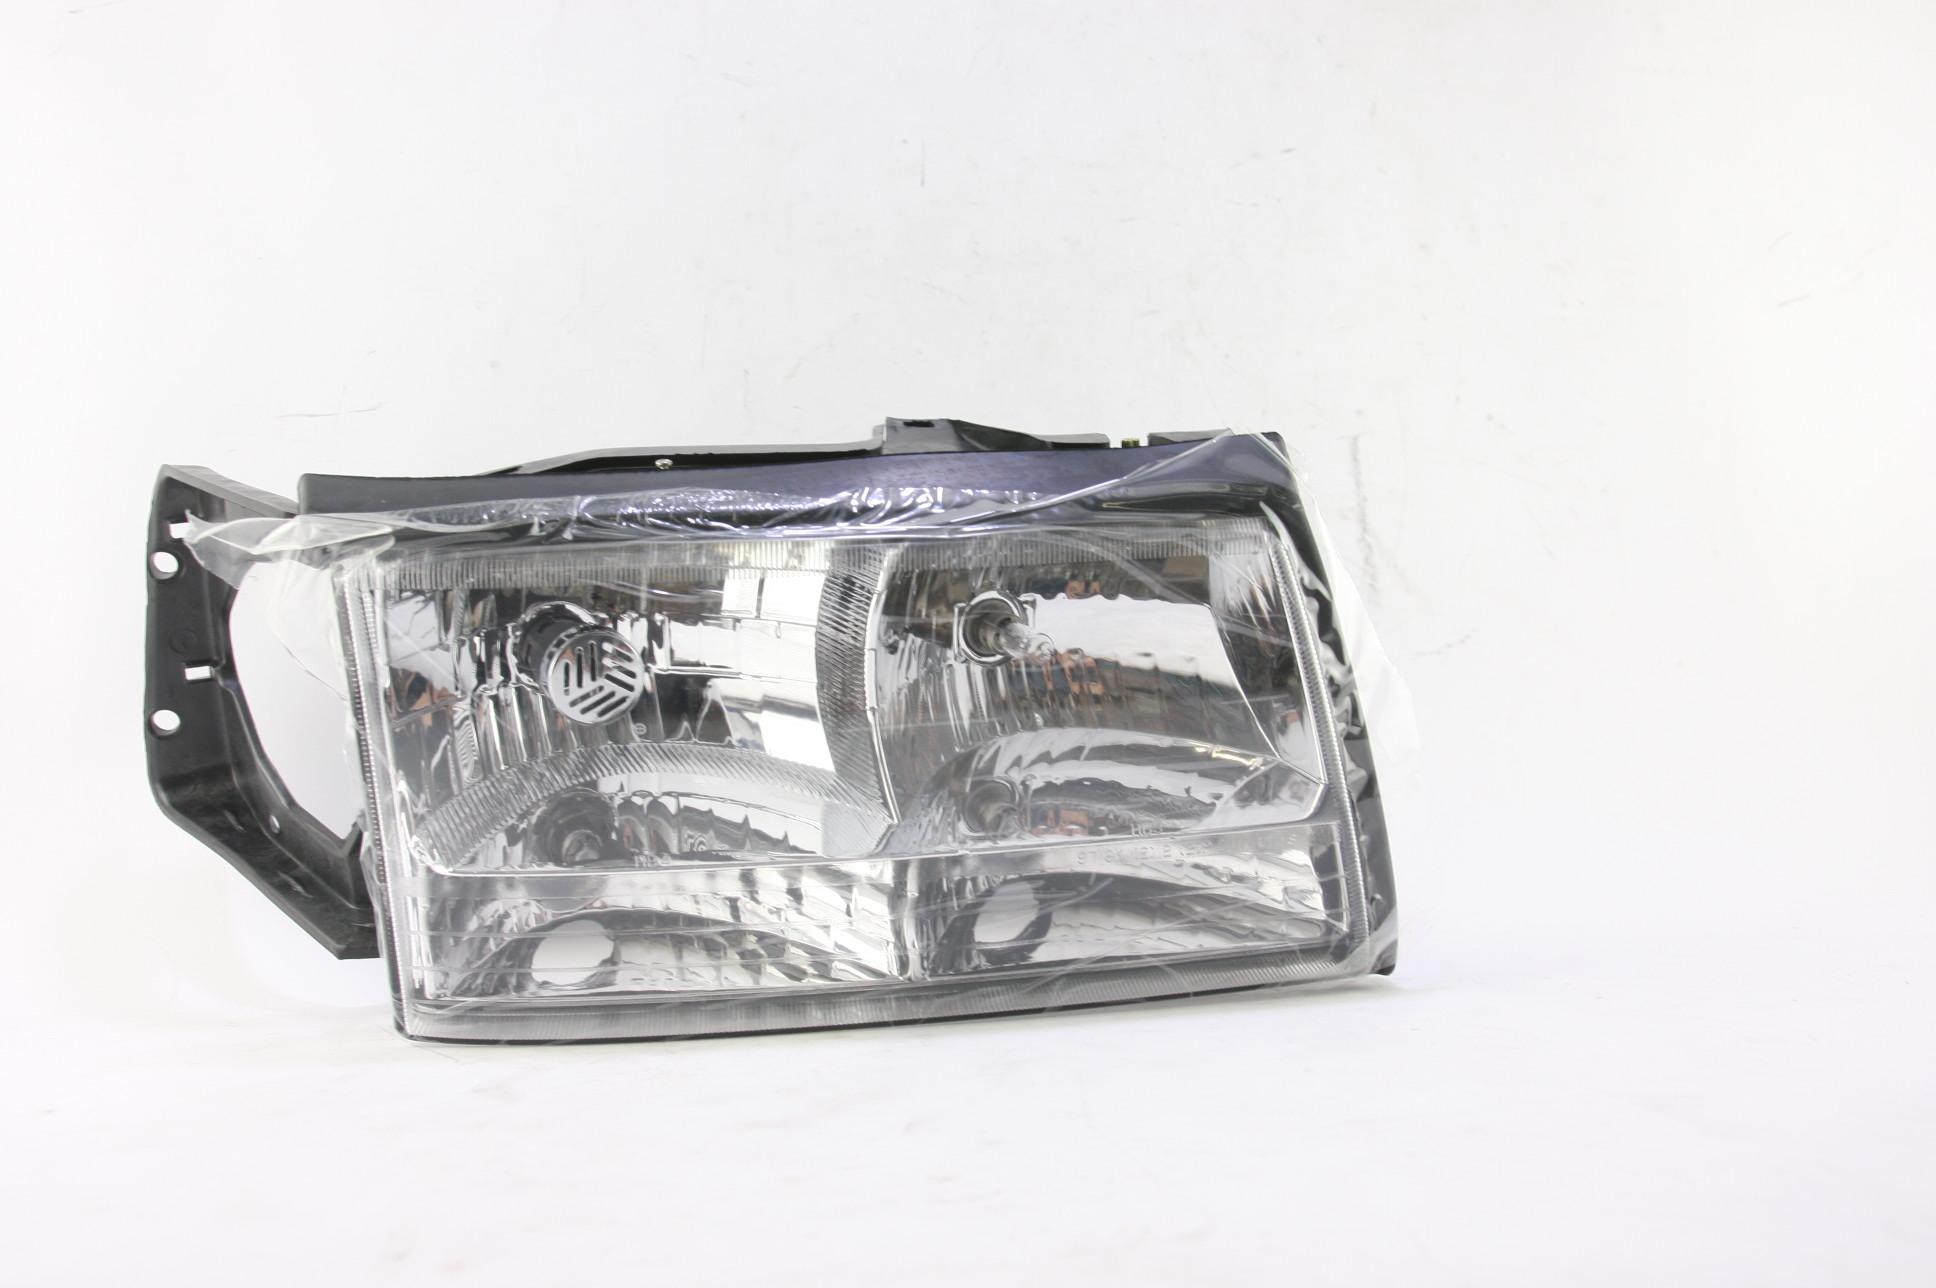 New Gm Oem 16526200 Front Head Light Lamp Rh Penger 97 99 Cadillac